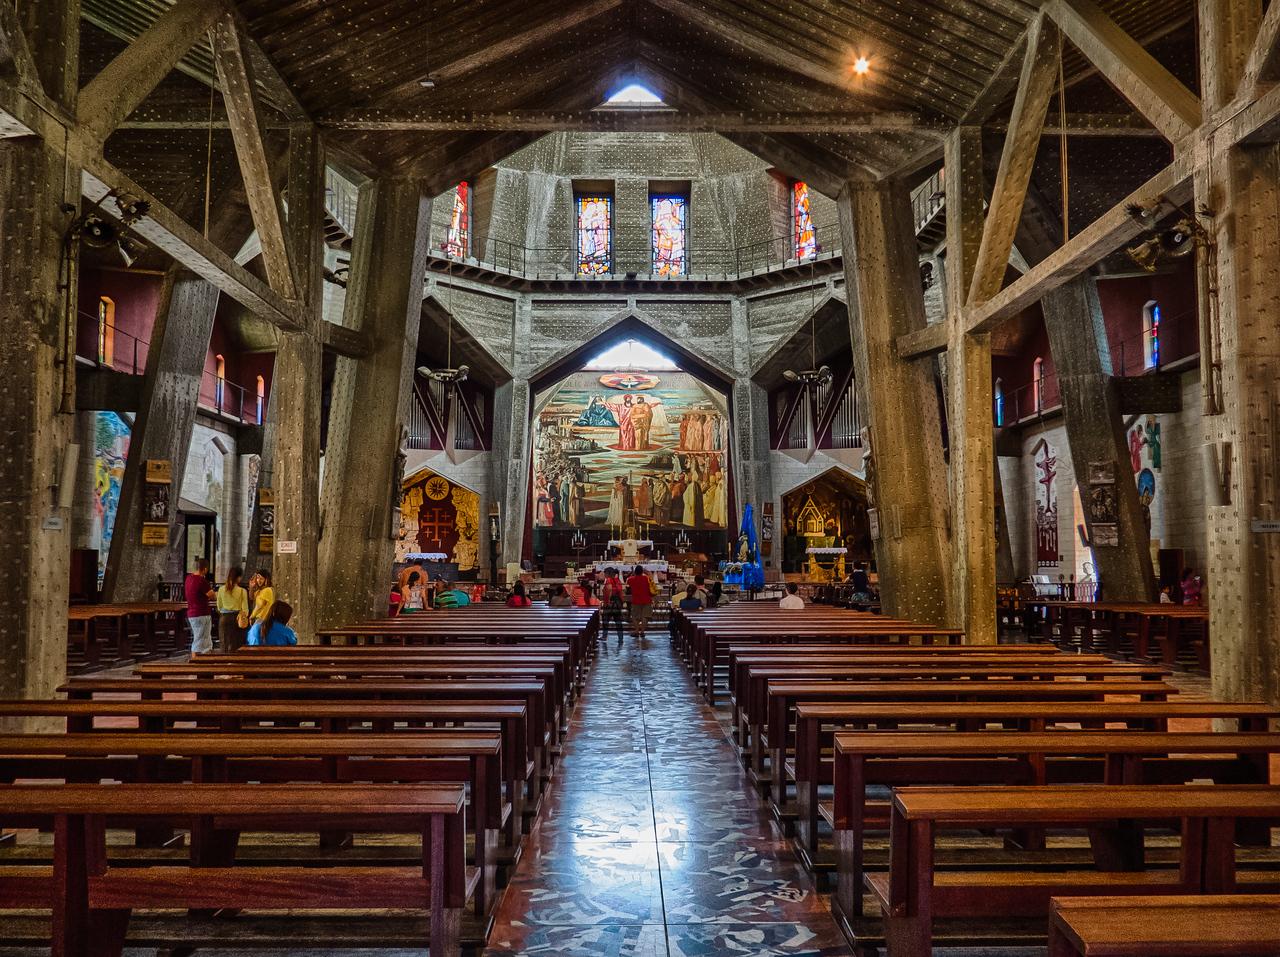 Church of the Annunciation, Nazareth